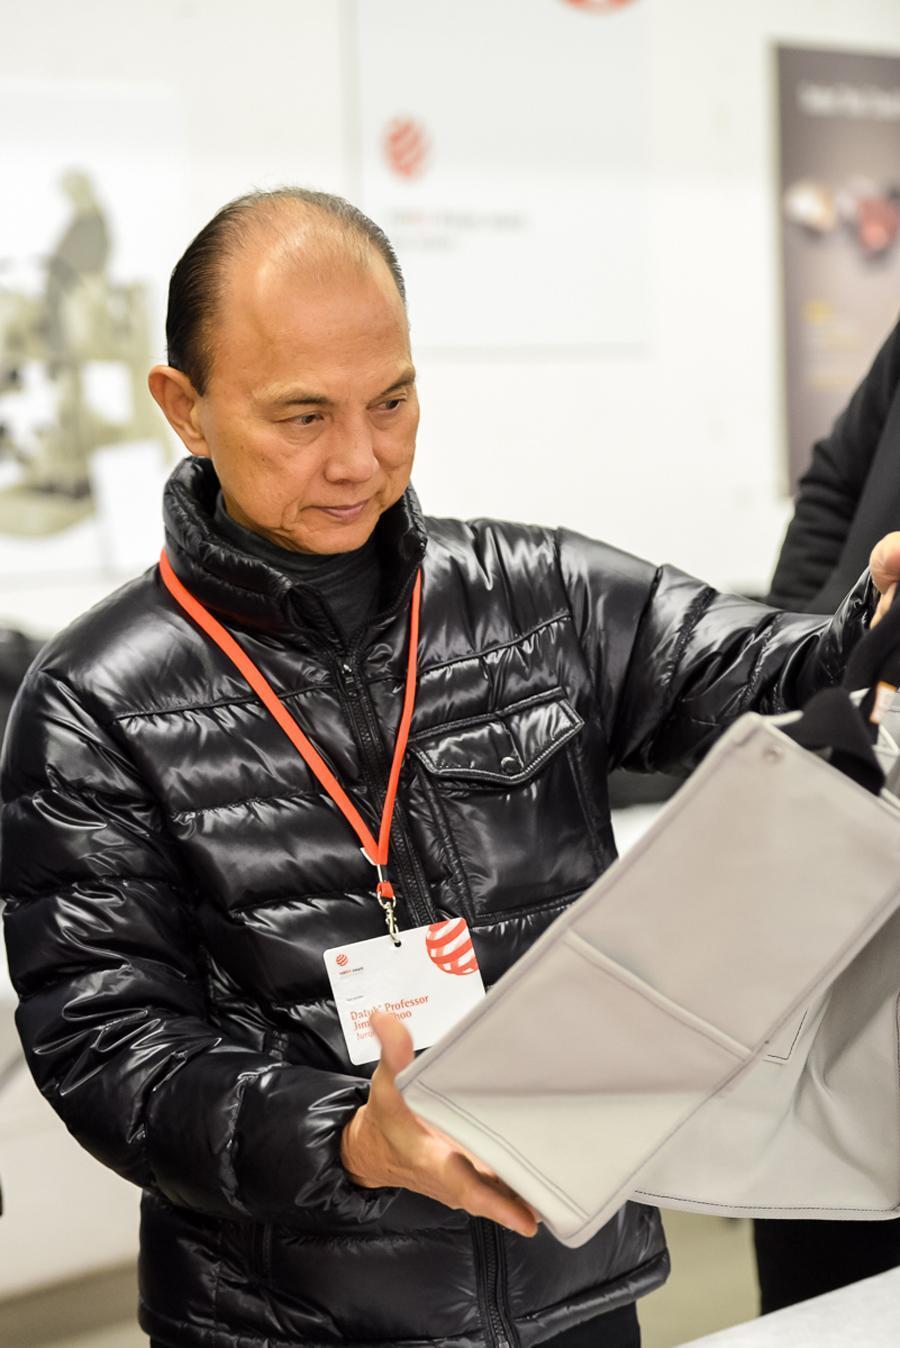 Schuhdesigner Jimmy Choo